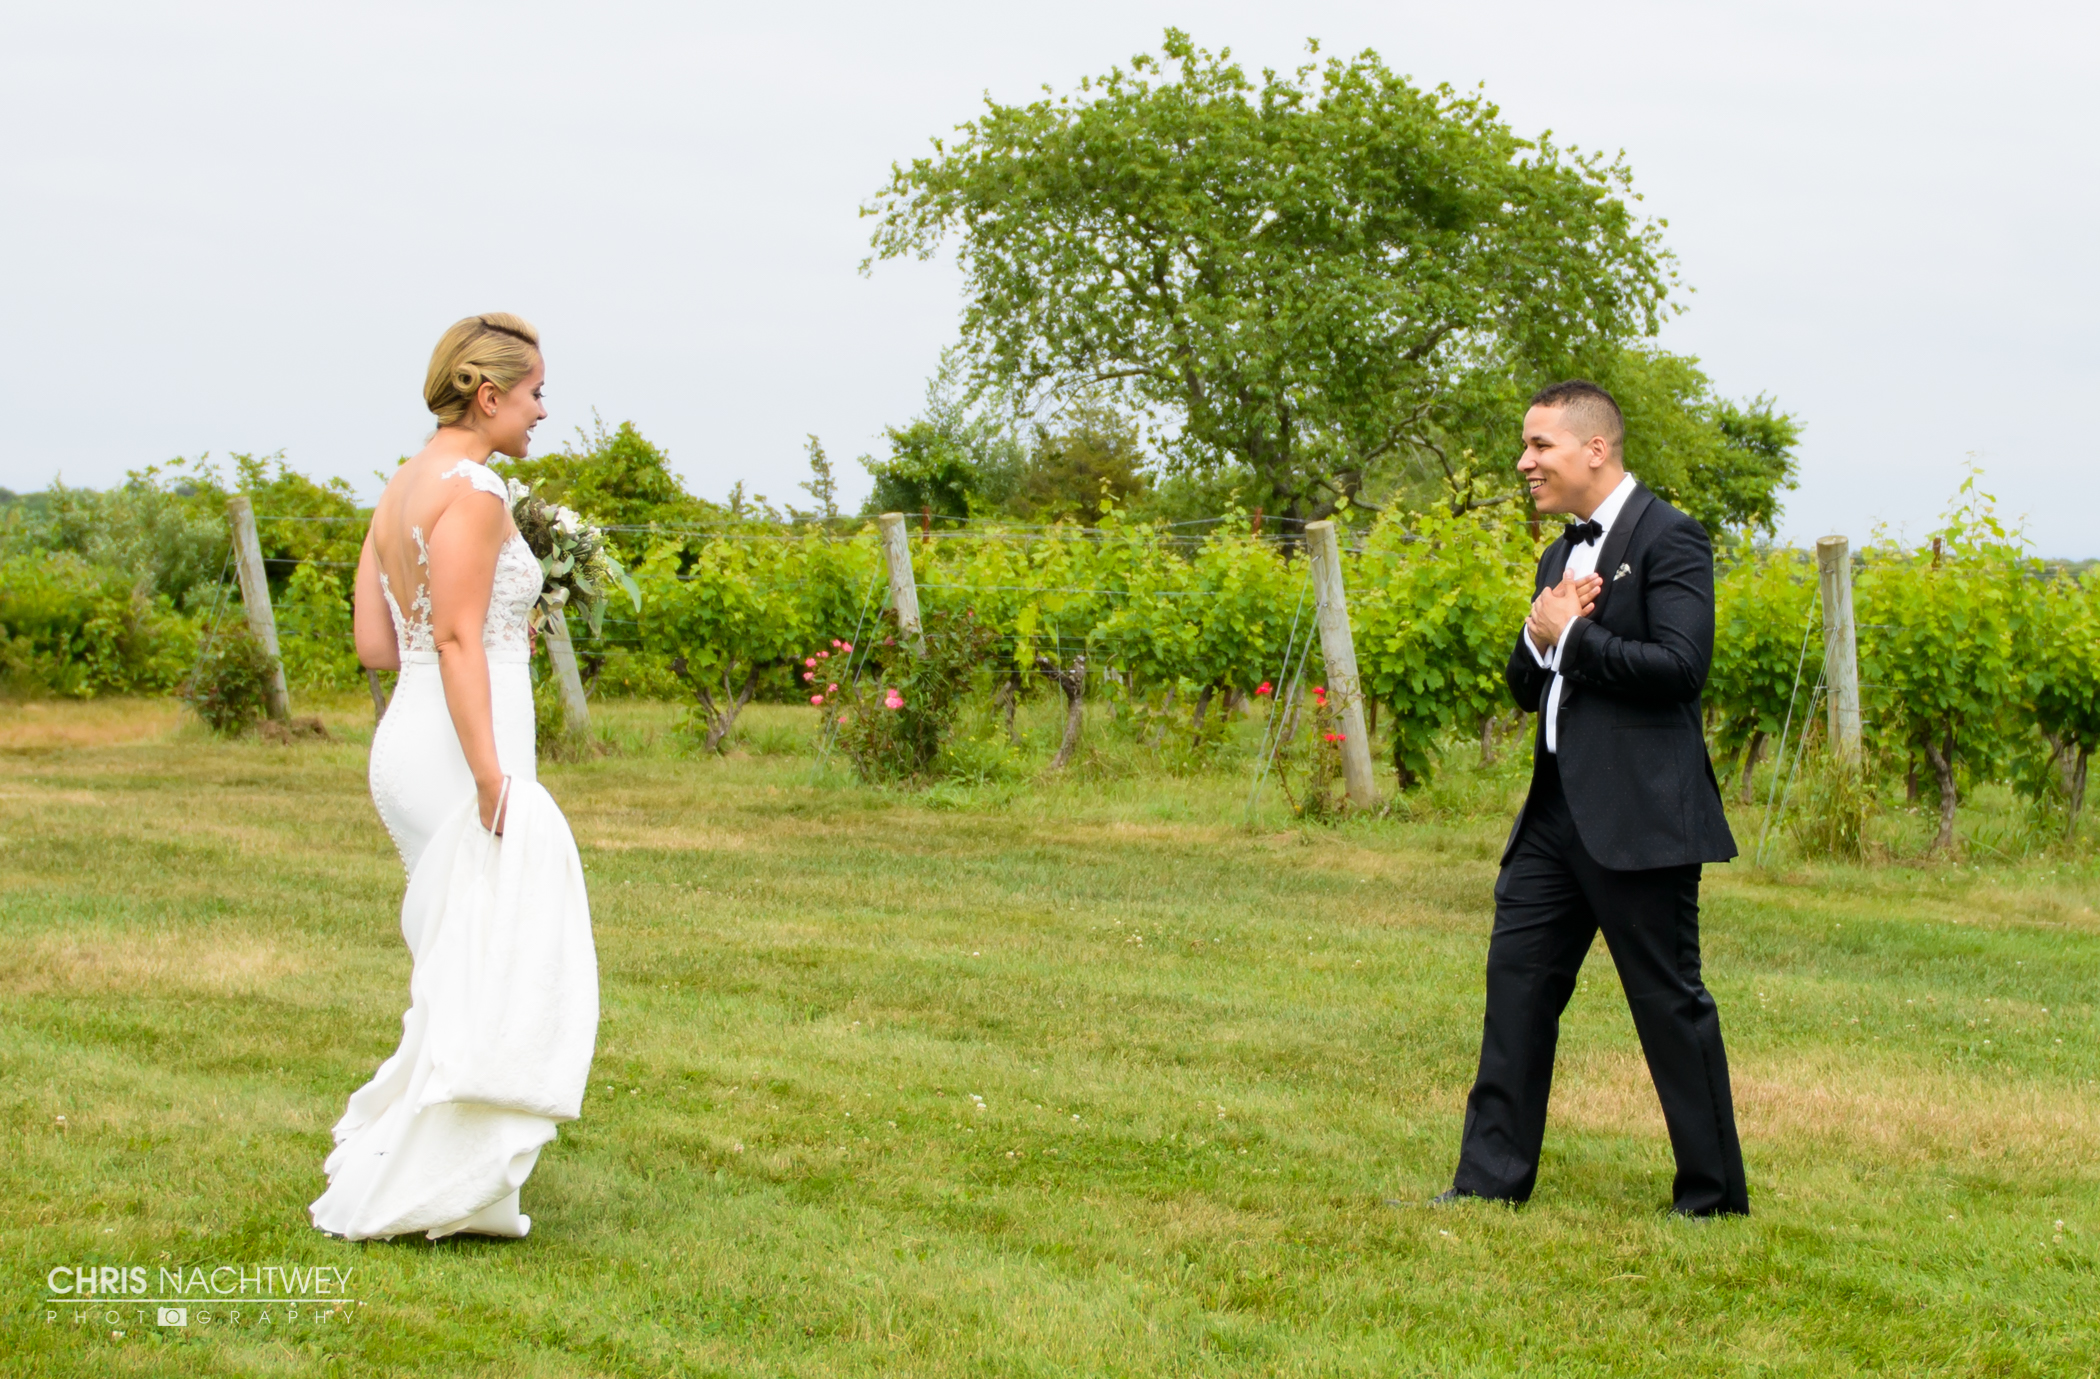 wedding-saltwater-farm-vineyard-photos-stonington-ct-chris-nachtwey-photography-2016-ana-austin-14.jpg